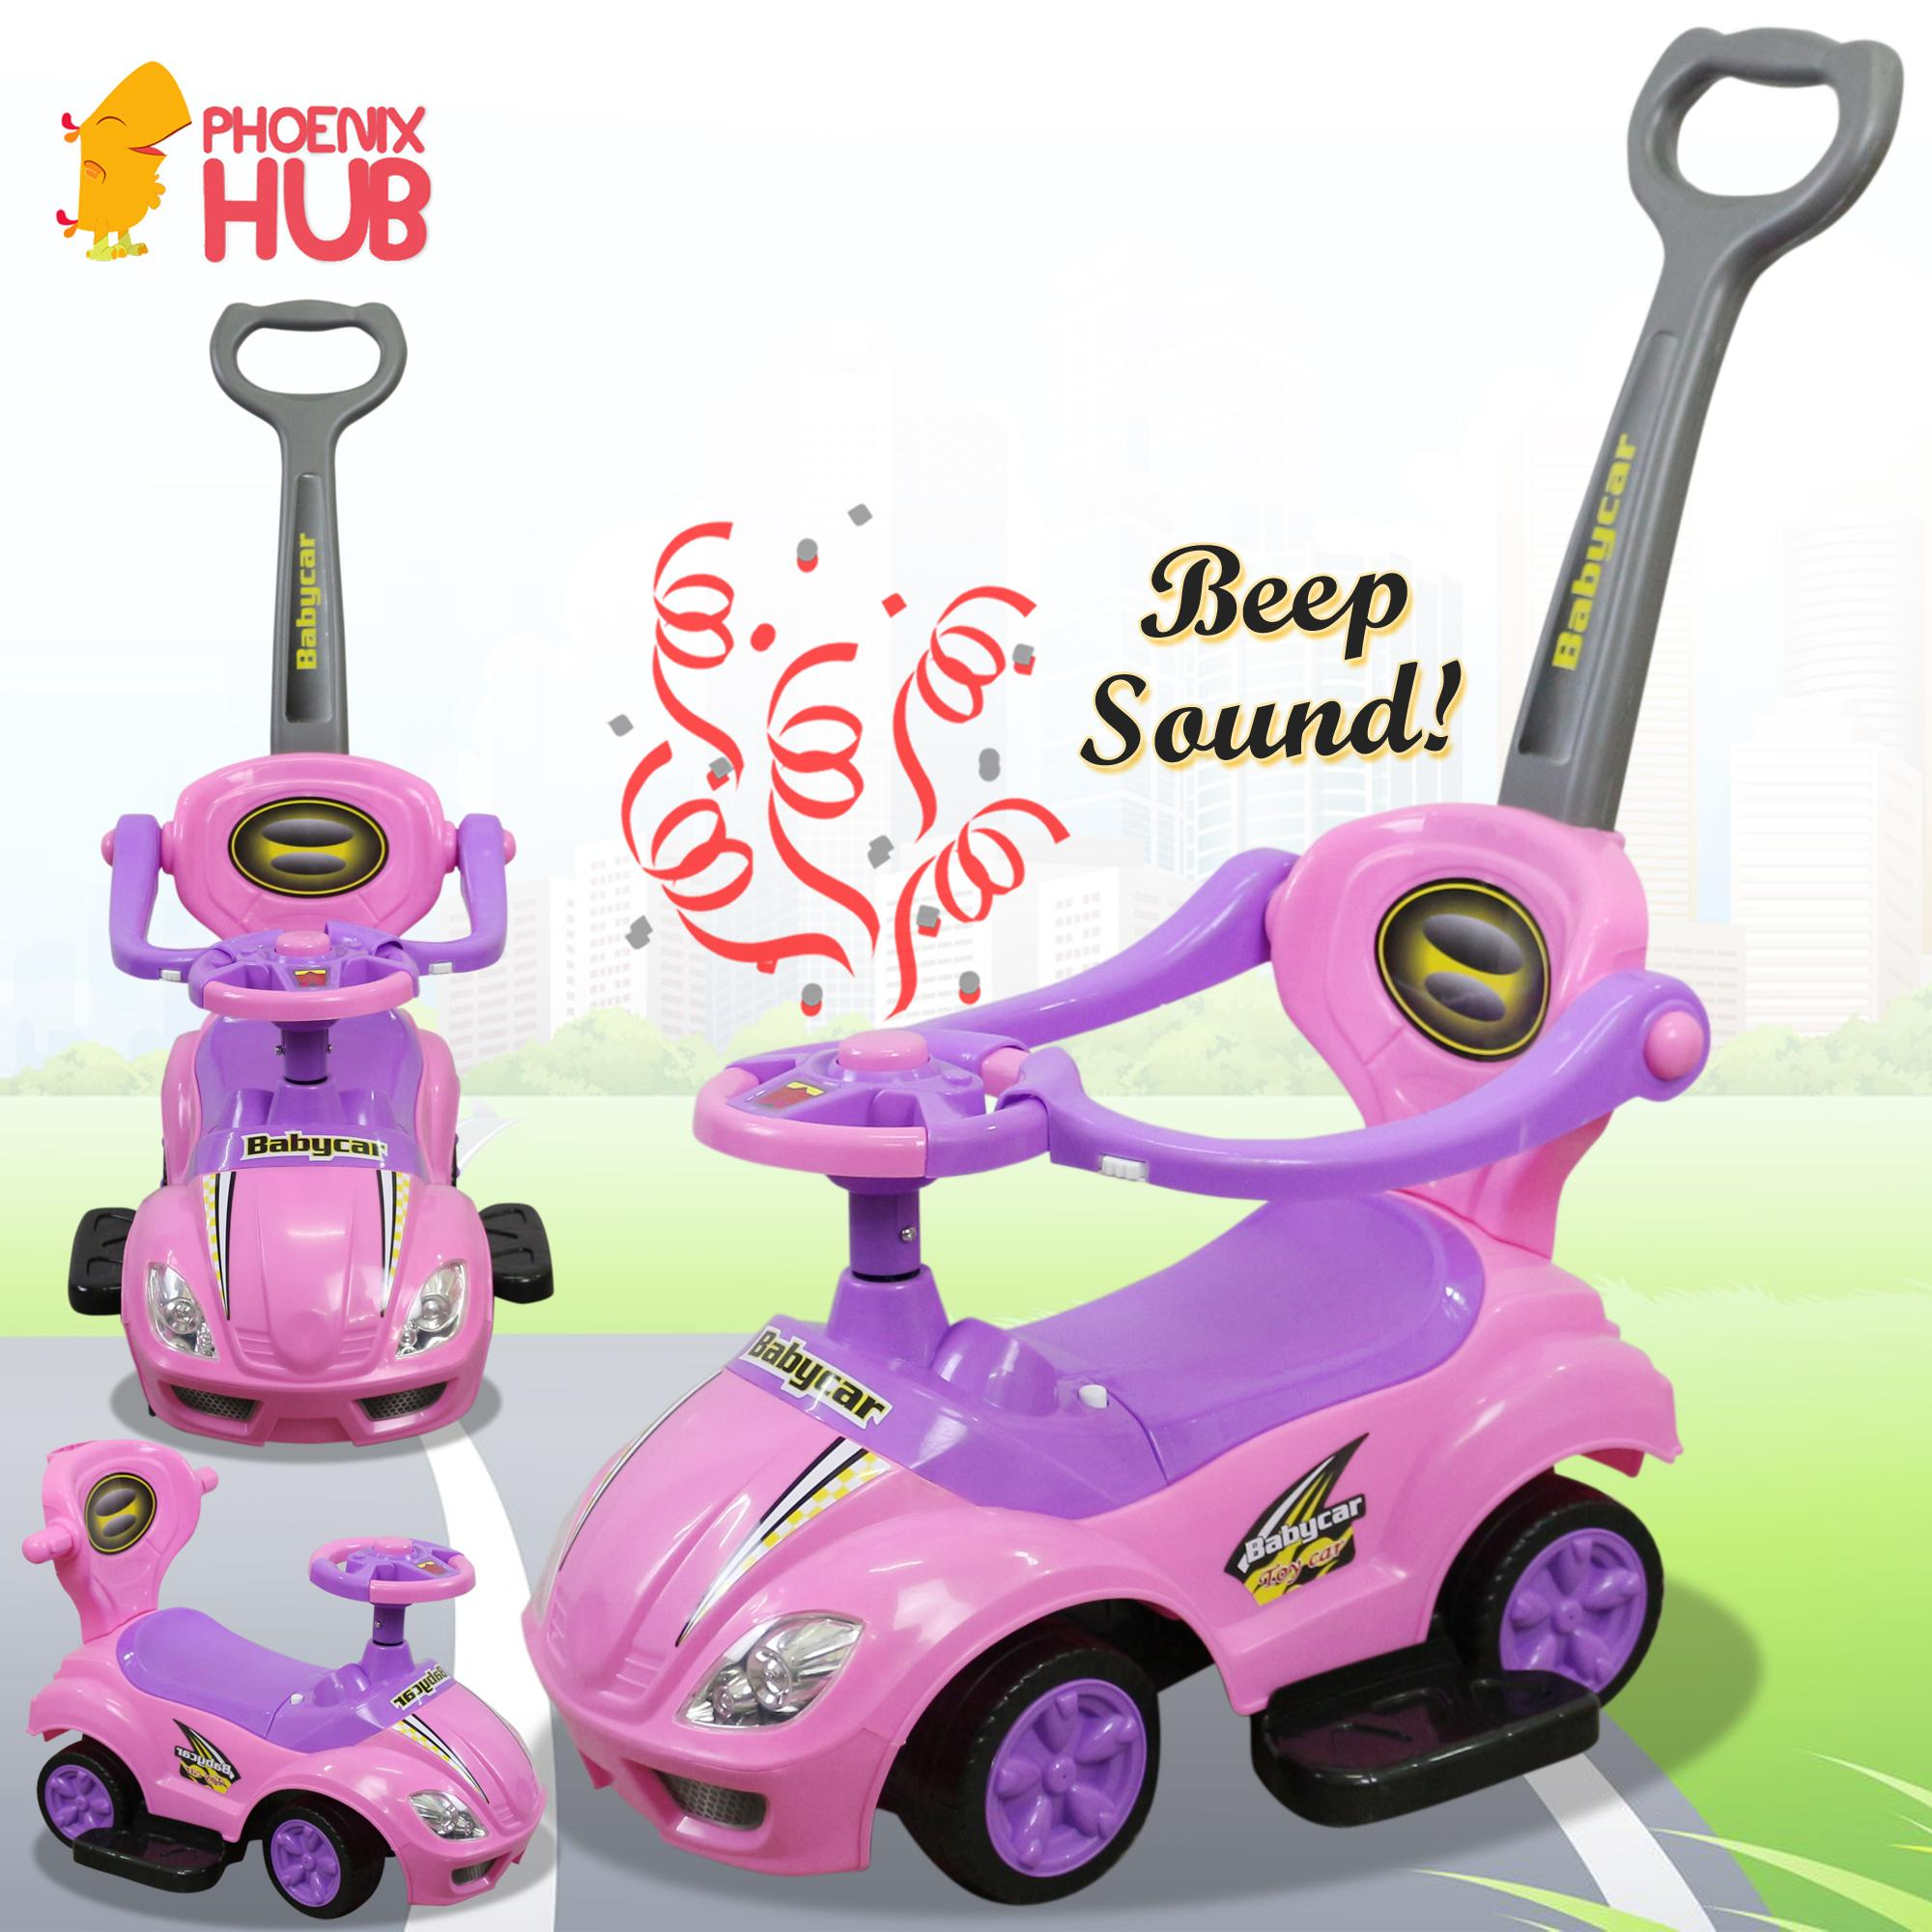 Phoenixhub Bebemio Deluxe Mega Riding Toy Car Baby Car Ride-On Push Stroller Children Ride-On With Music By Phoenix Hub.